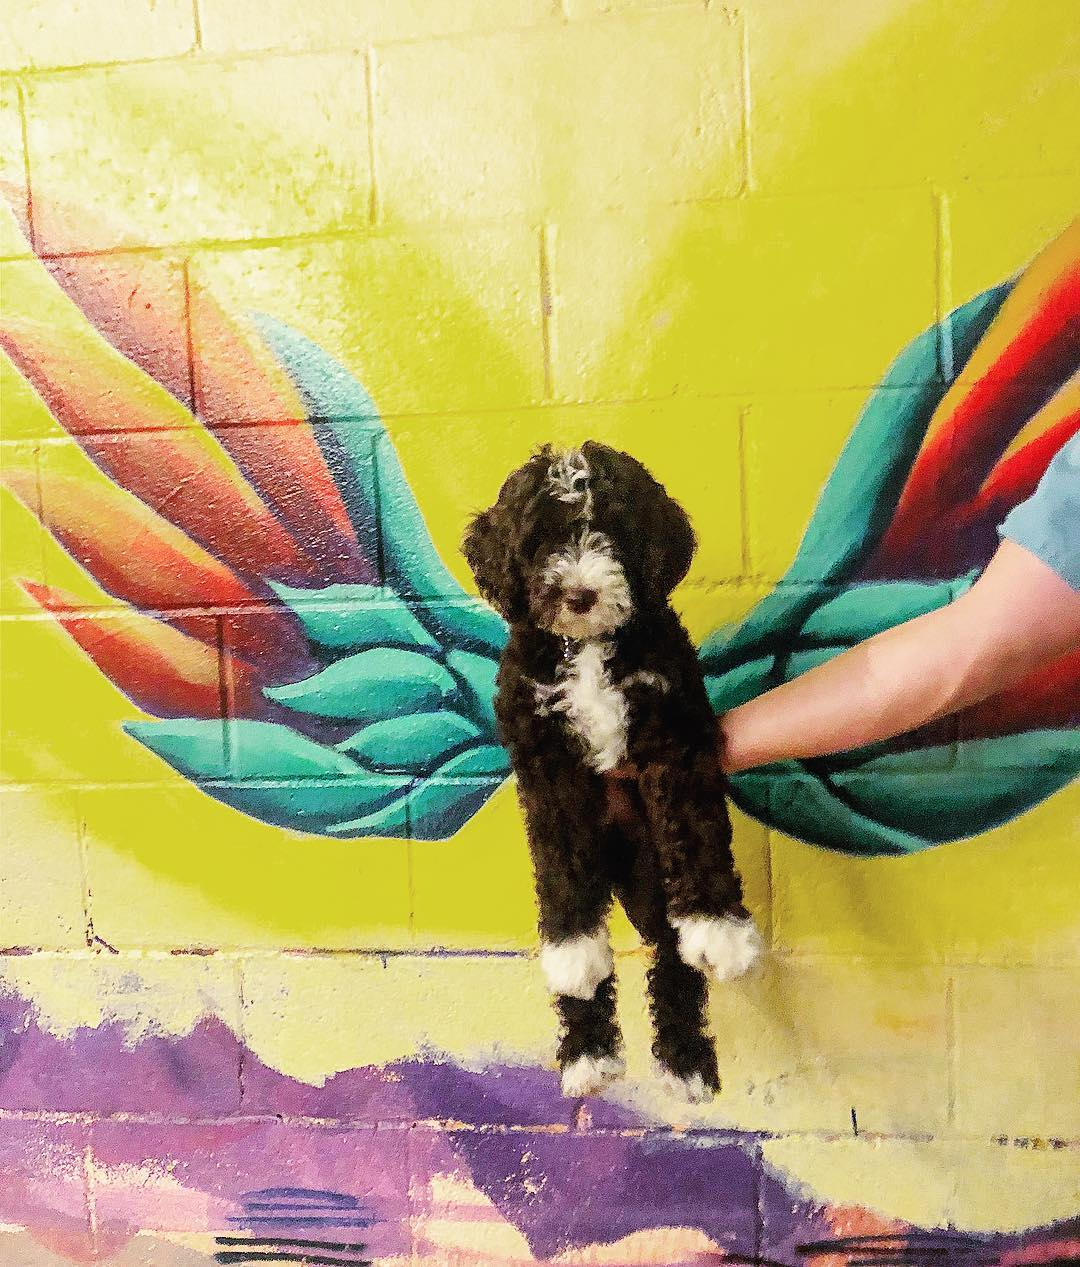 Birmingham, Alabama, Newcomers' guide to Birmingham, mural, dog, Wings of Avondale